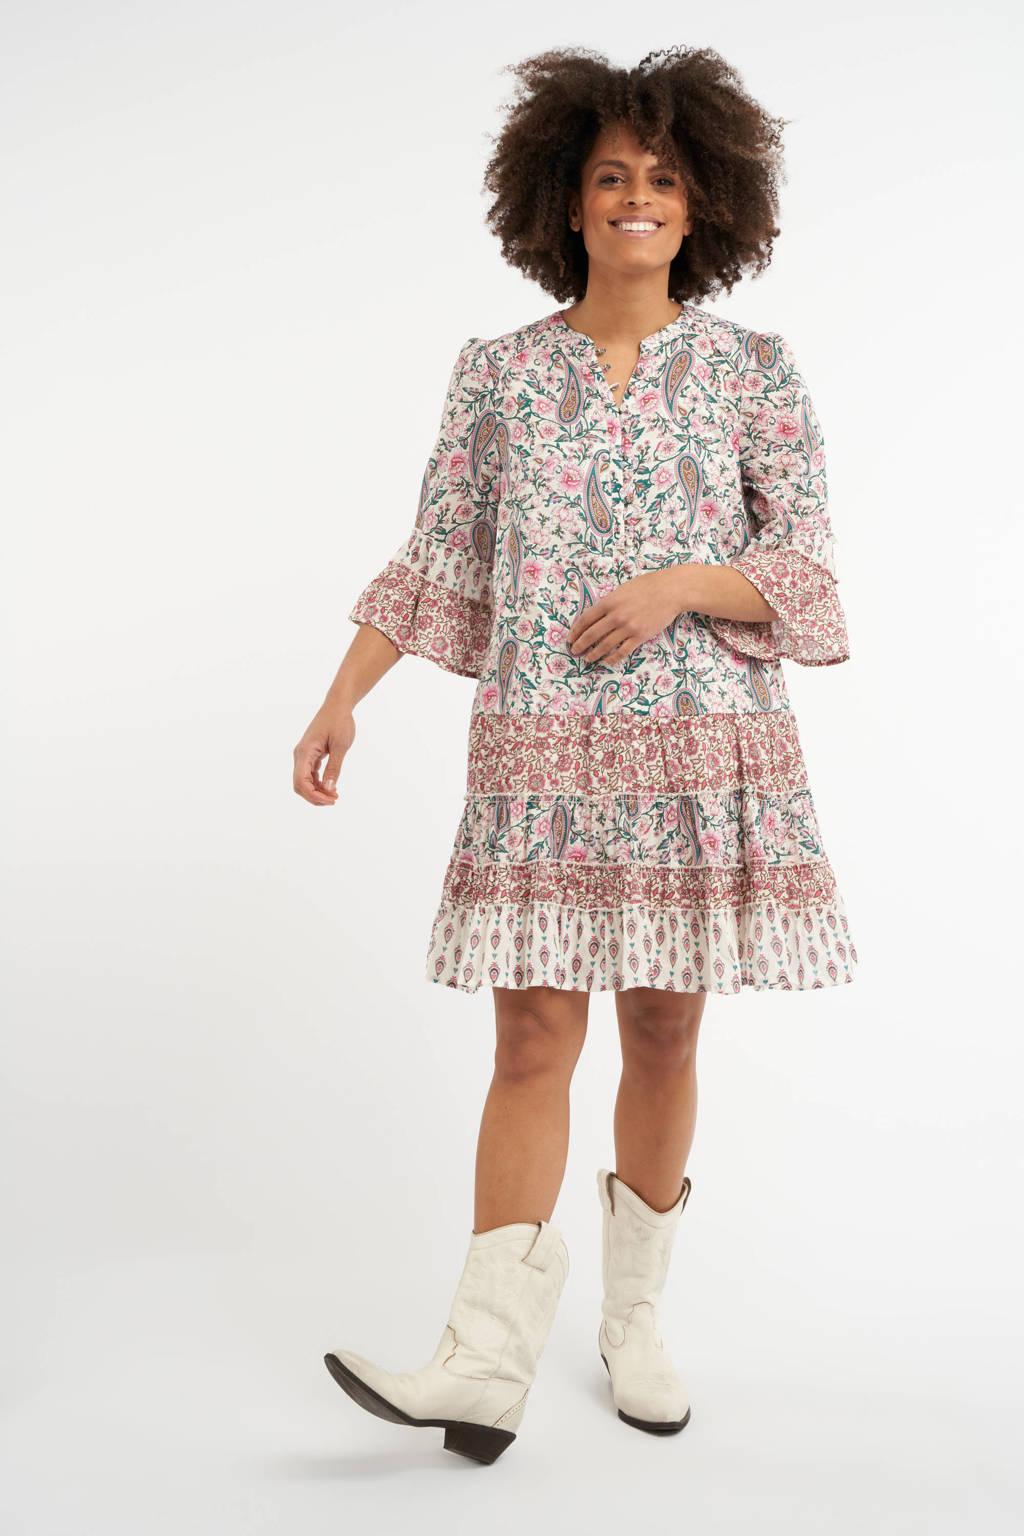 MS Mode A-lijn jurk met paisleyprint en ruches ecru/roze/petrol, Ecru/roze/petrol